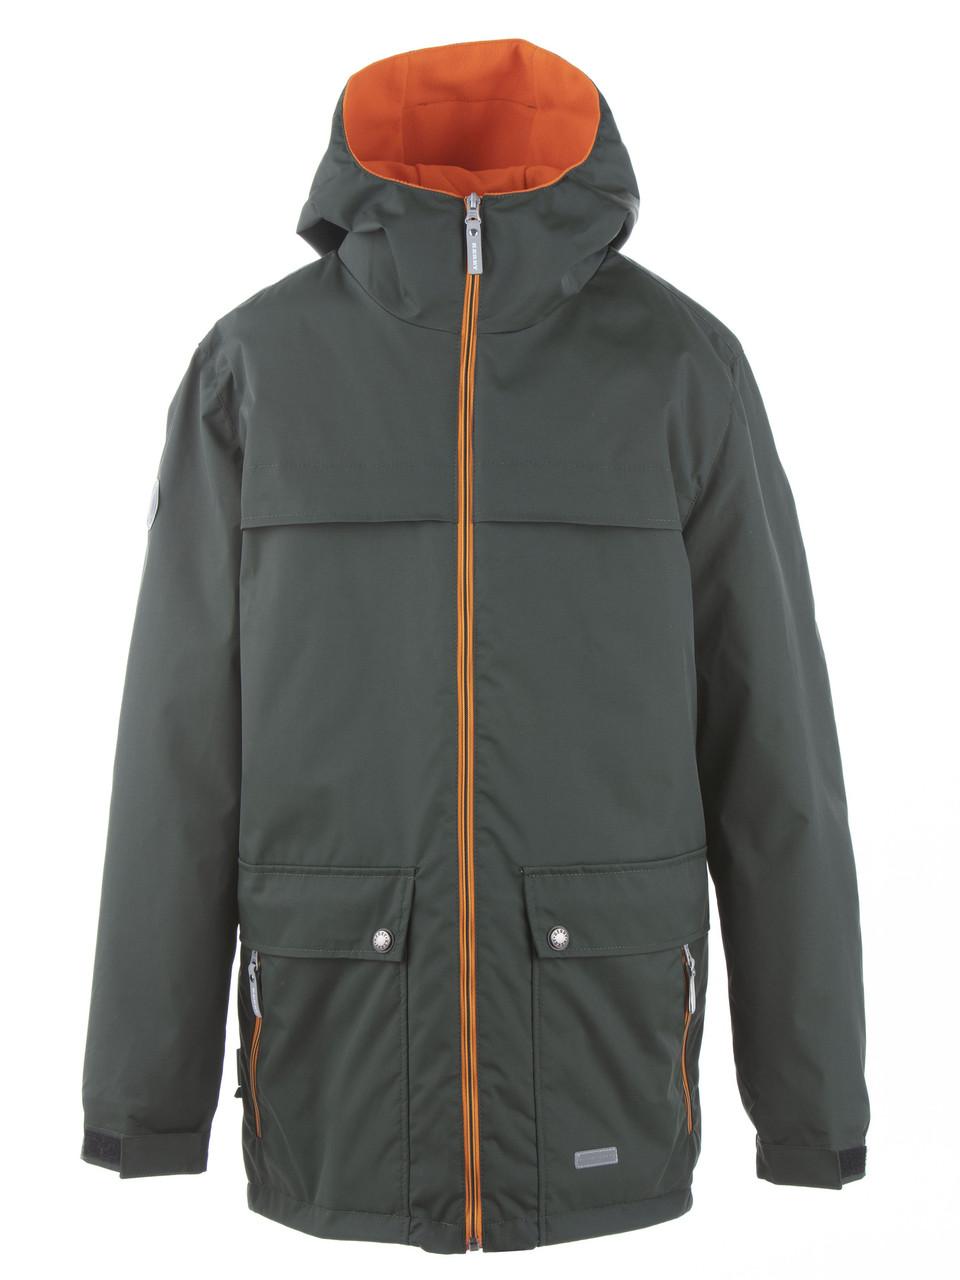 Kуртка-парка для мальчиков Kerry RONAN